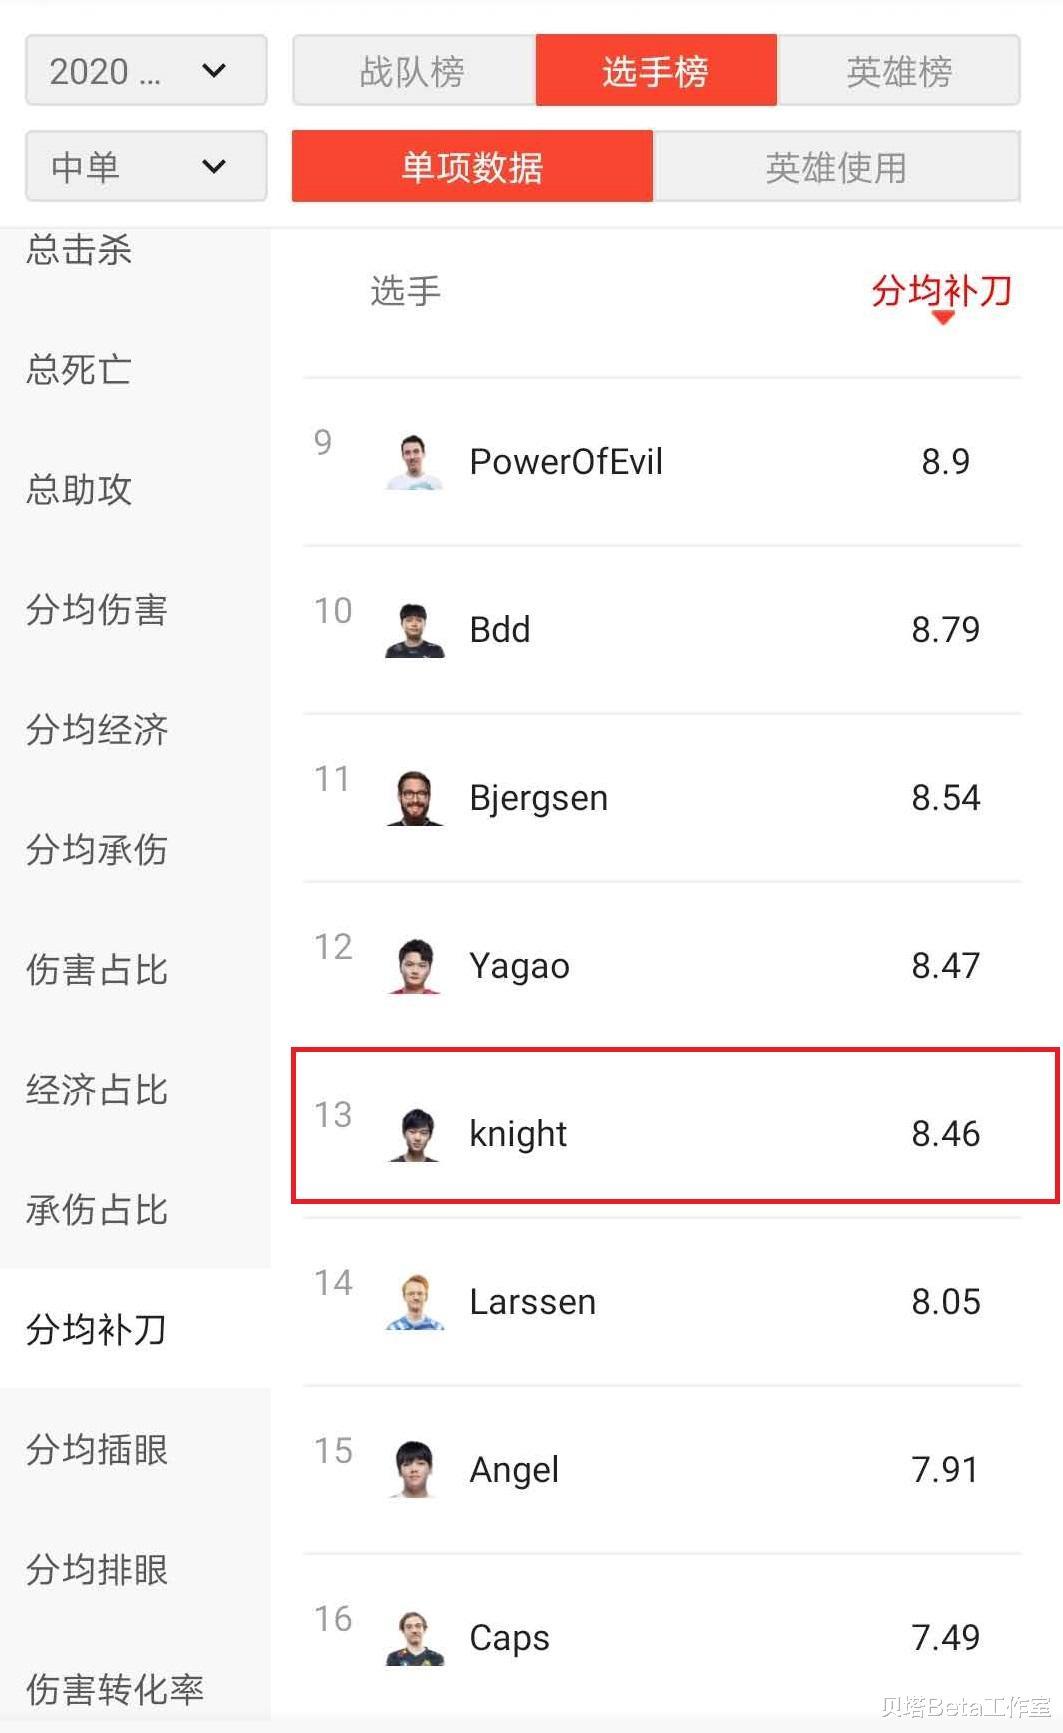 S10小組賽第1輪後,Knight被質疑表現不佳!7項數據排名倒數-圖4